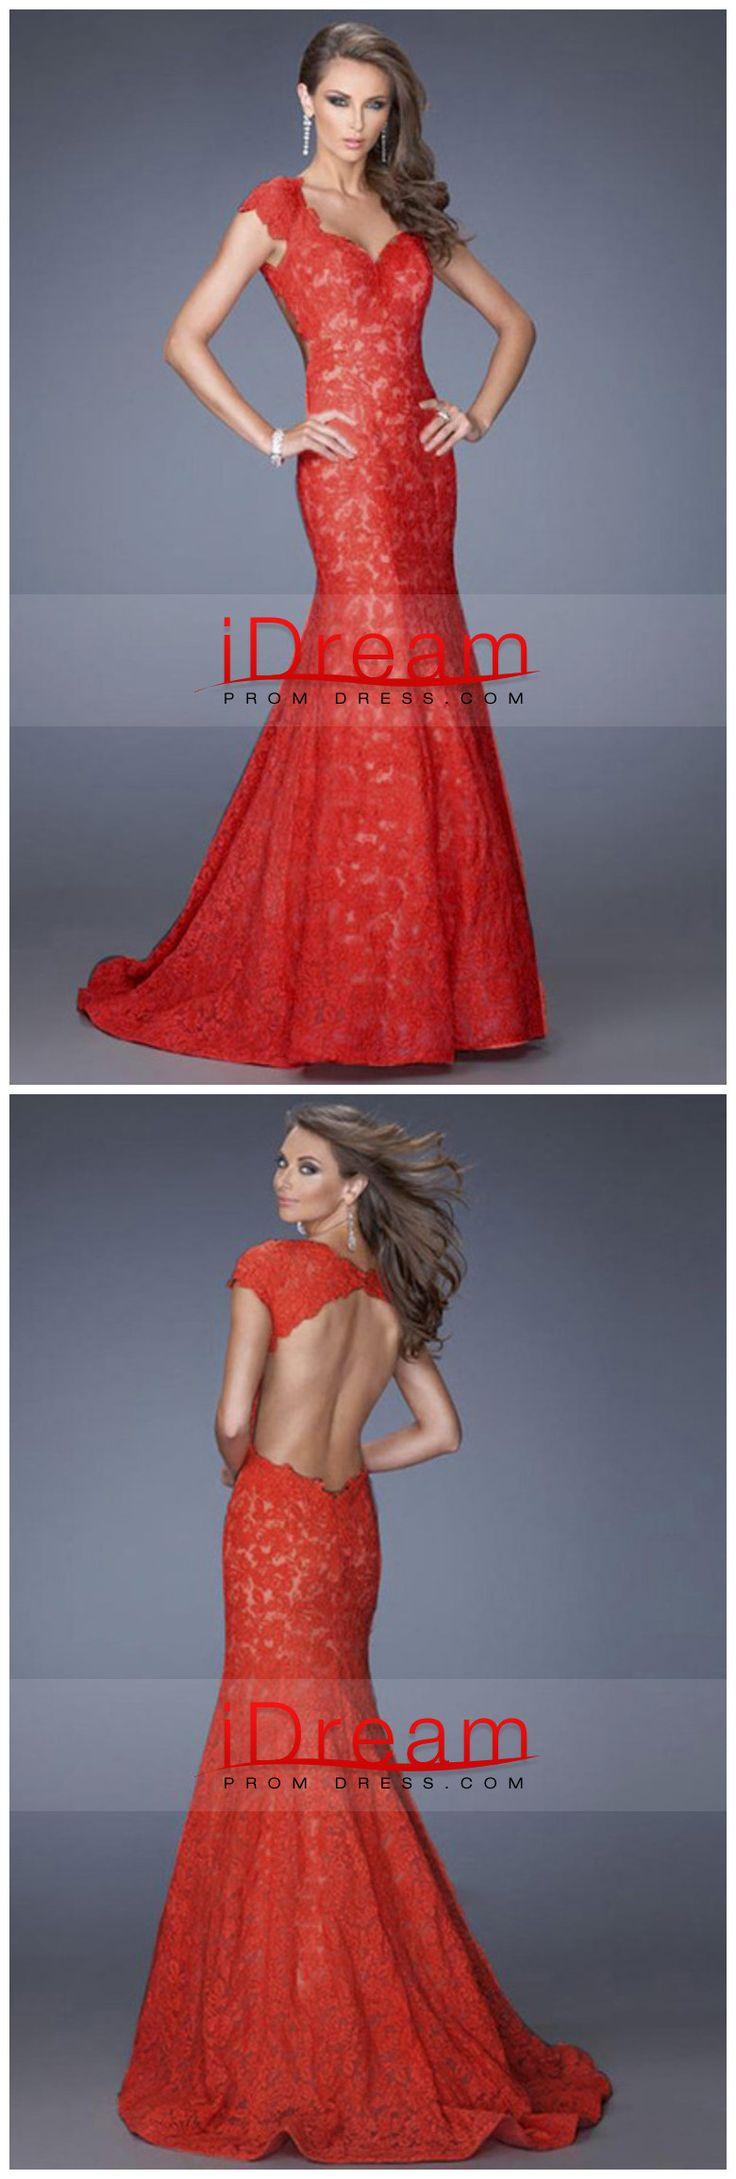 best fancy dresses images on pinterest graduation clothes and